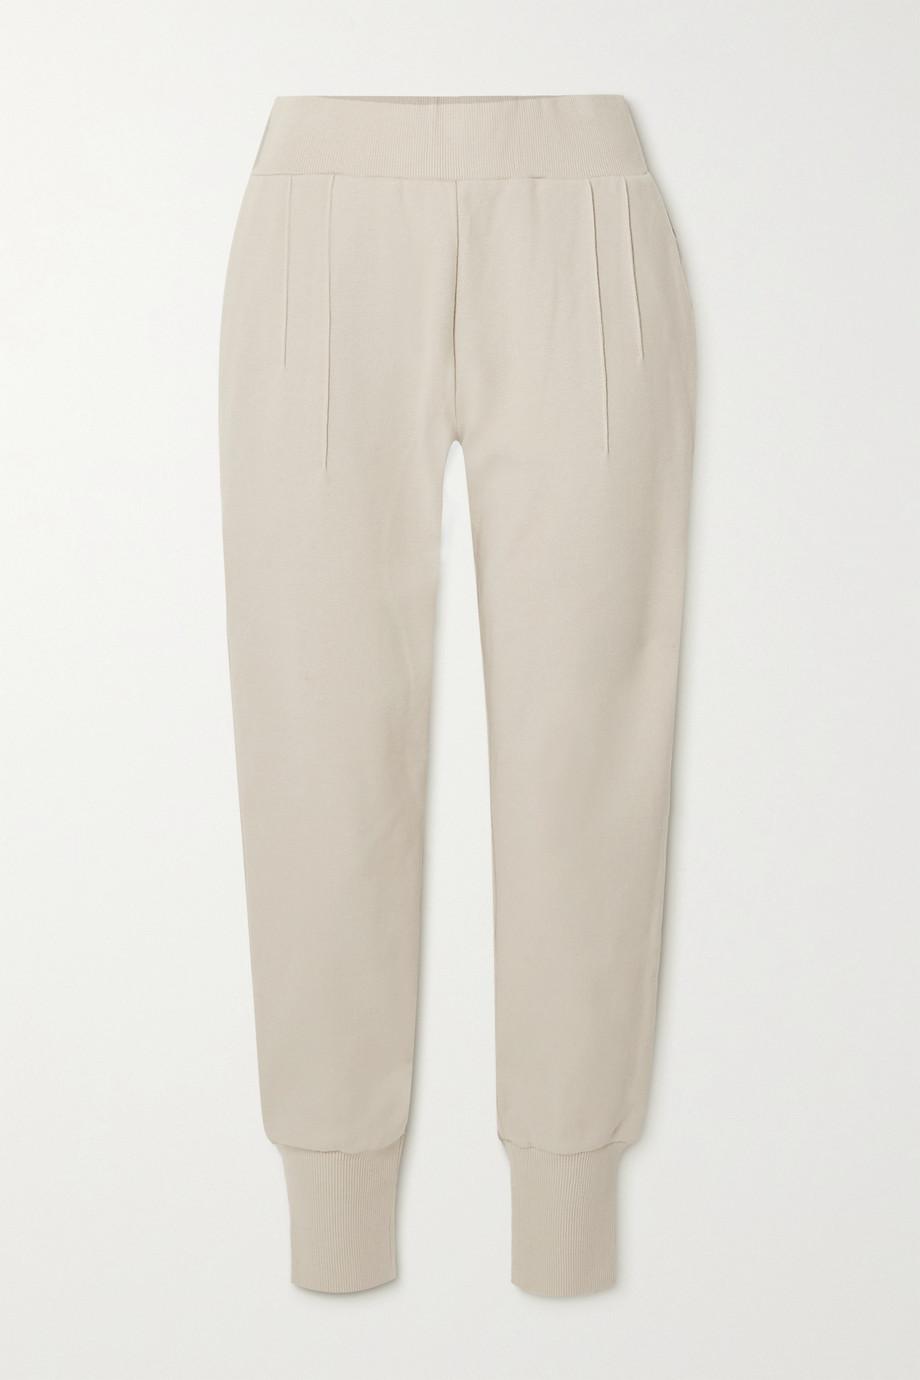 Varley Amberley stretch-cotton piqué track pants